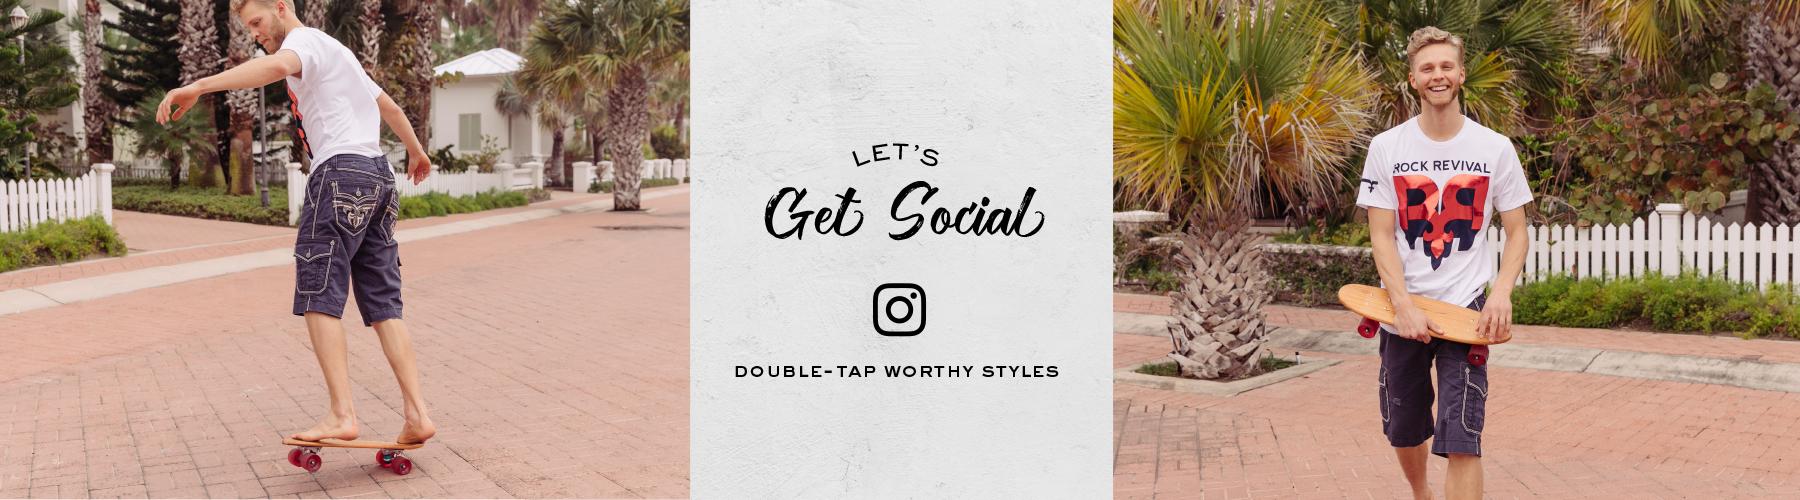 Guy skateboarding wearing Rock Revival shorts and tee. Let's get social, shop men's Instagram.